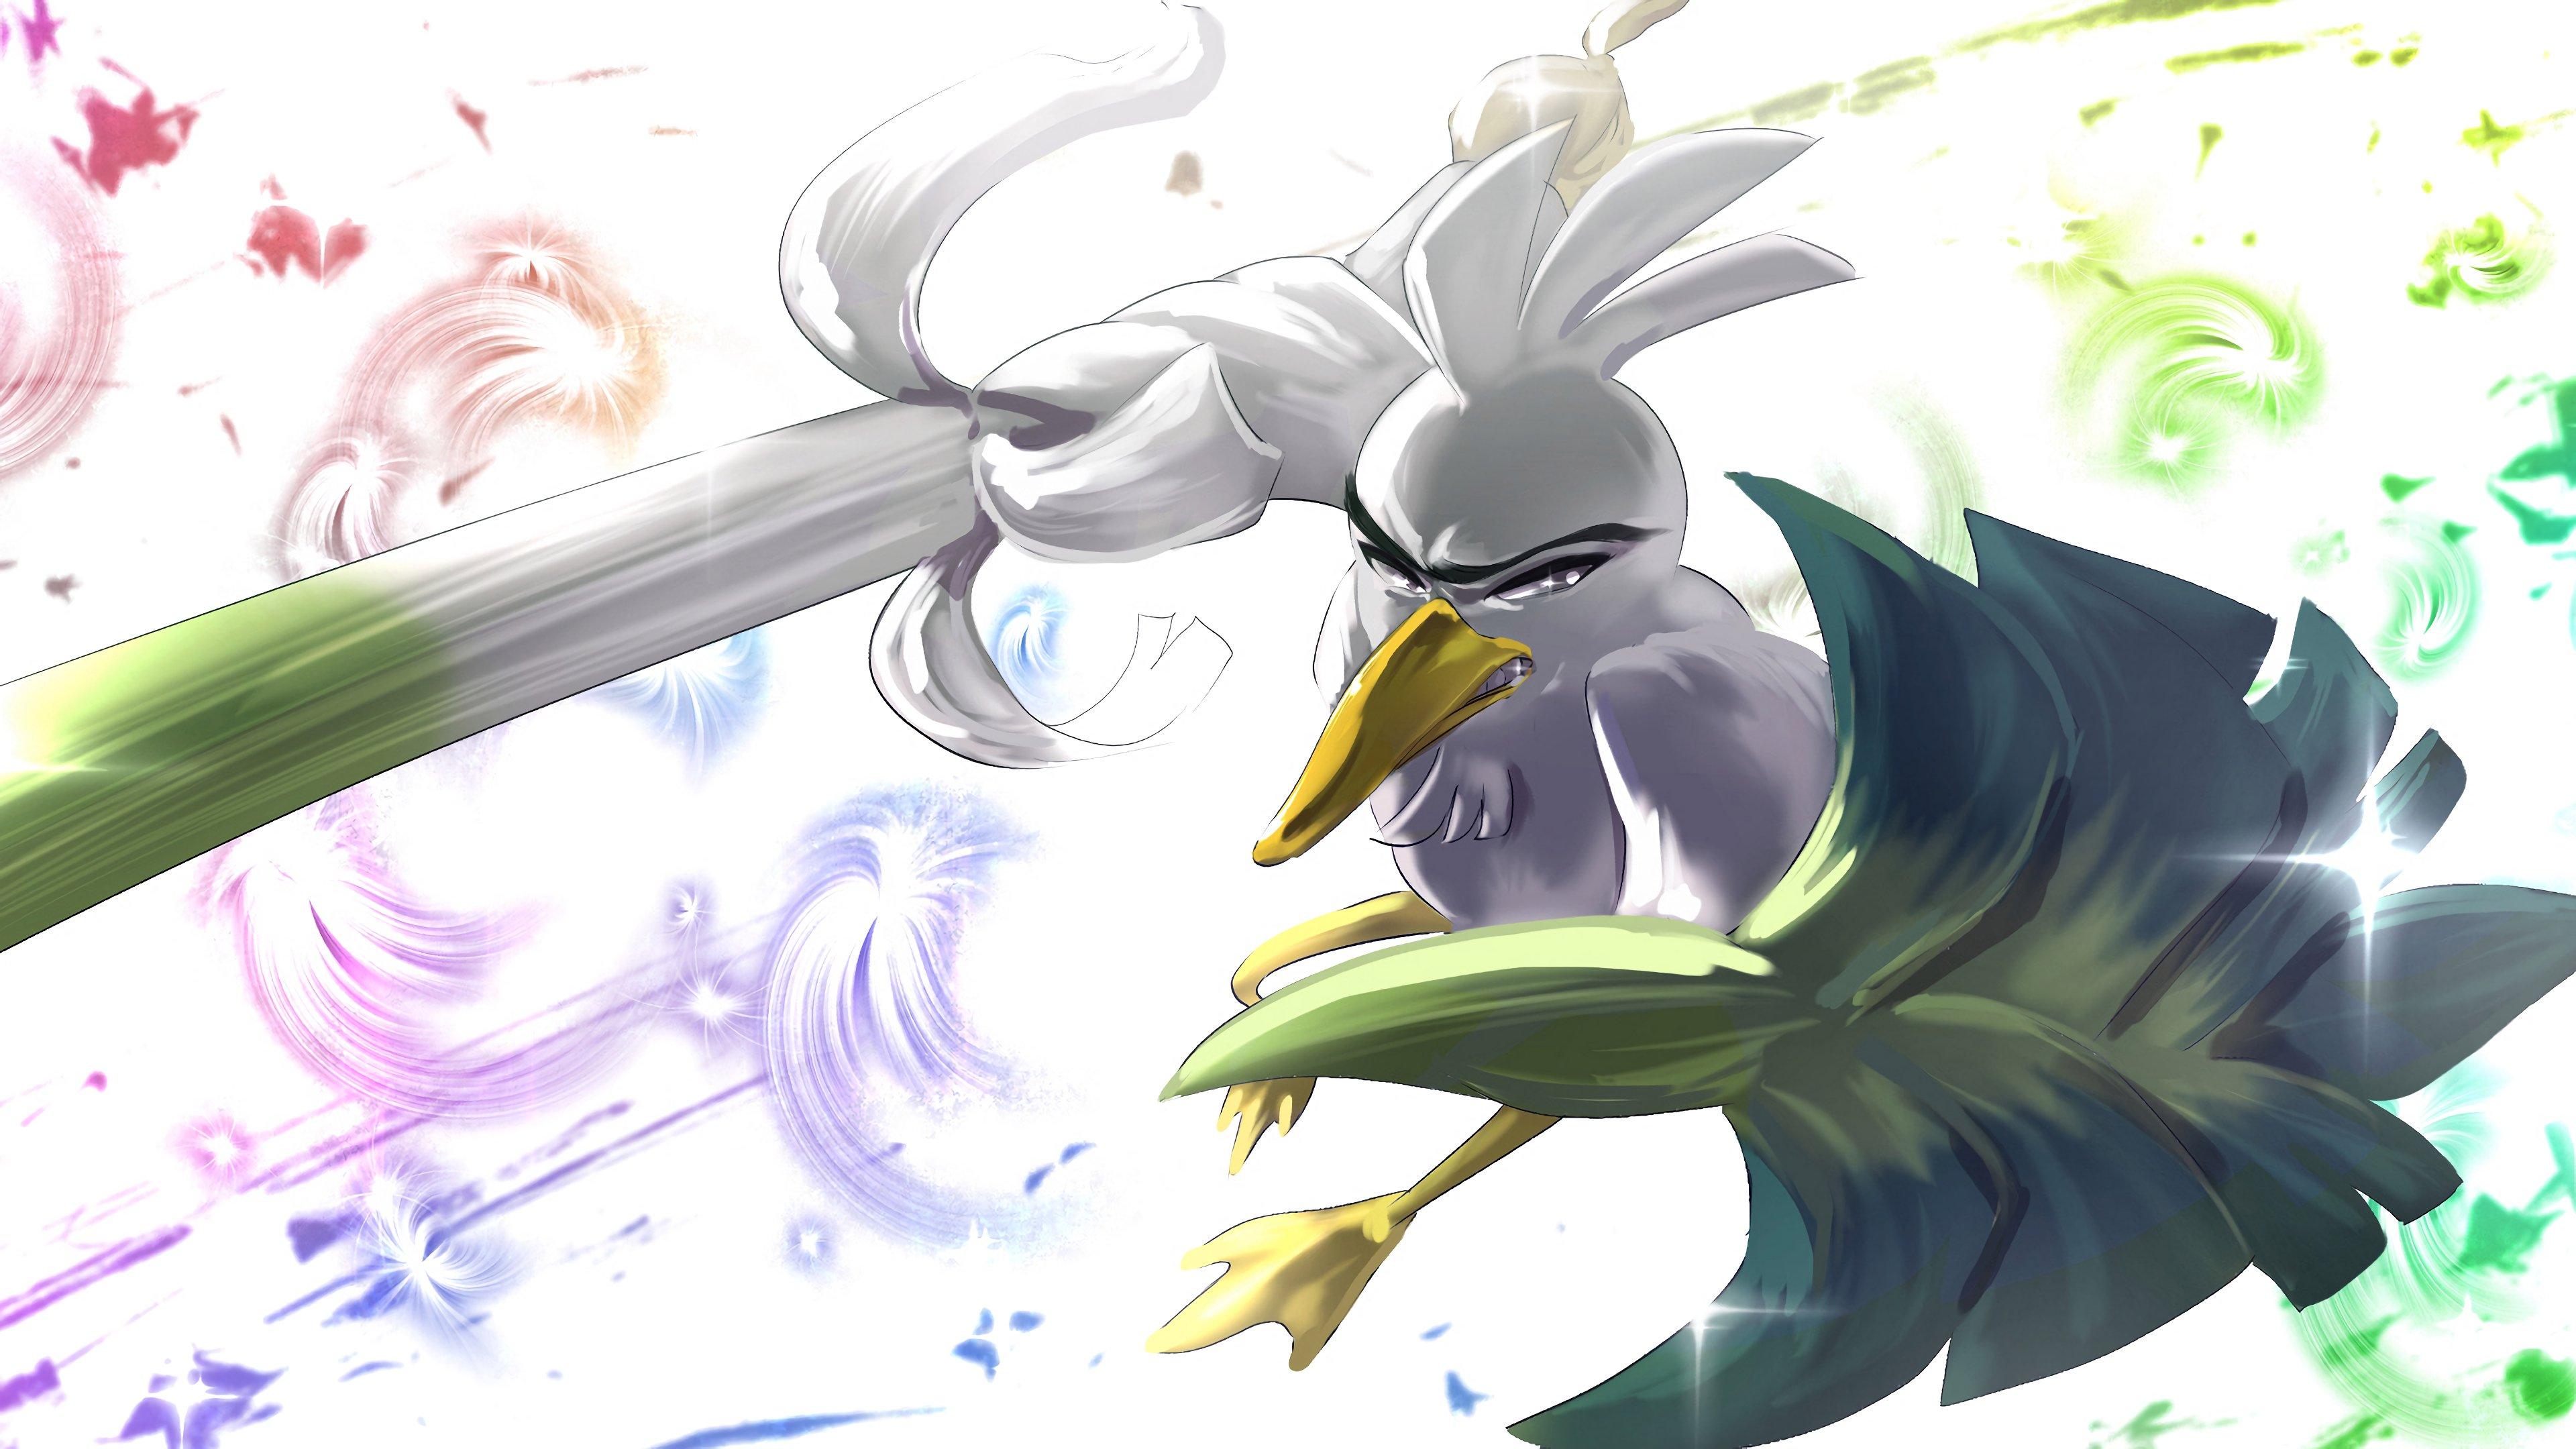 Fondos de pantalla Sirfetch'd Pokemon Espada y Pokemon Escudo